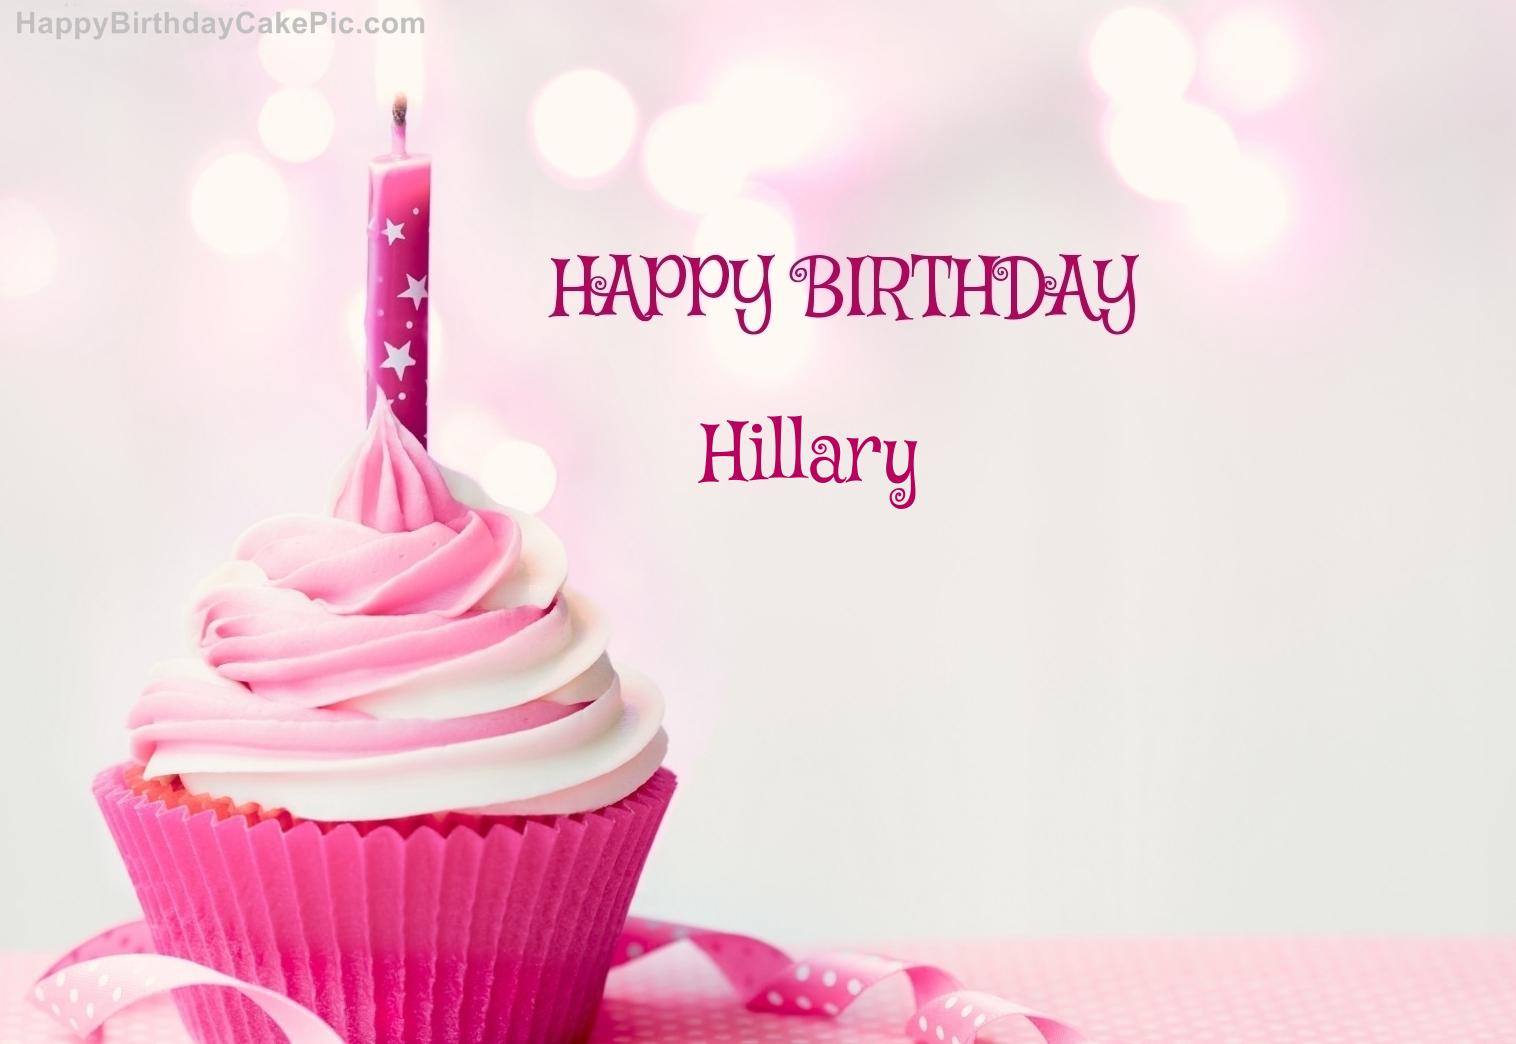 Happy Birthday Hillary Cake